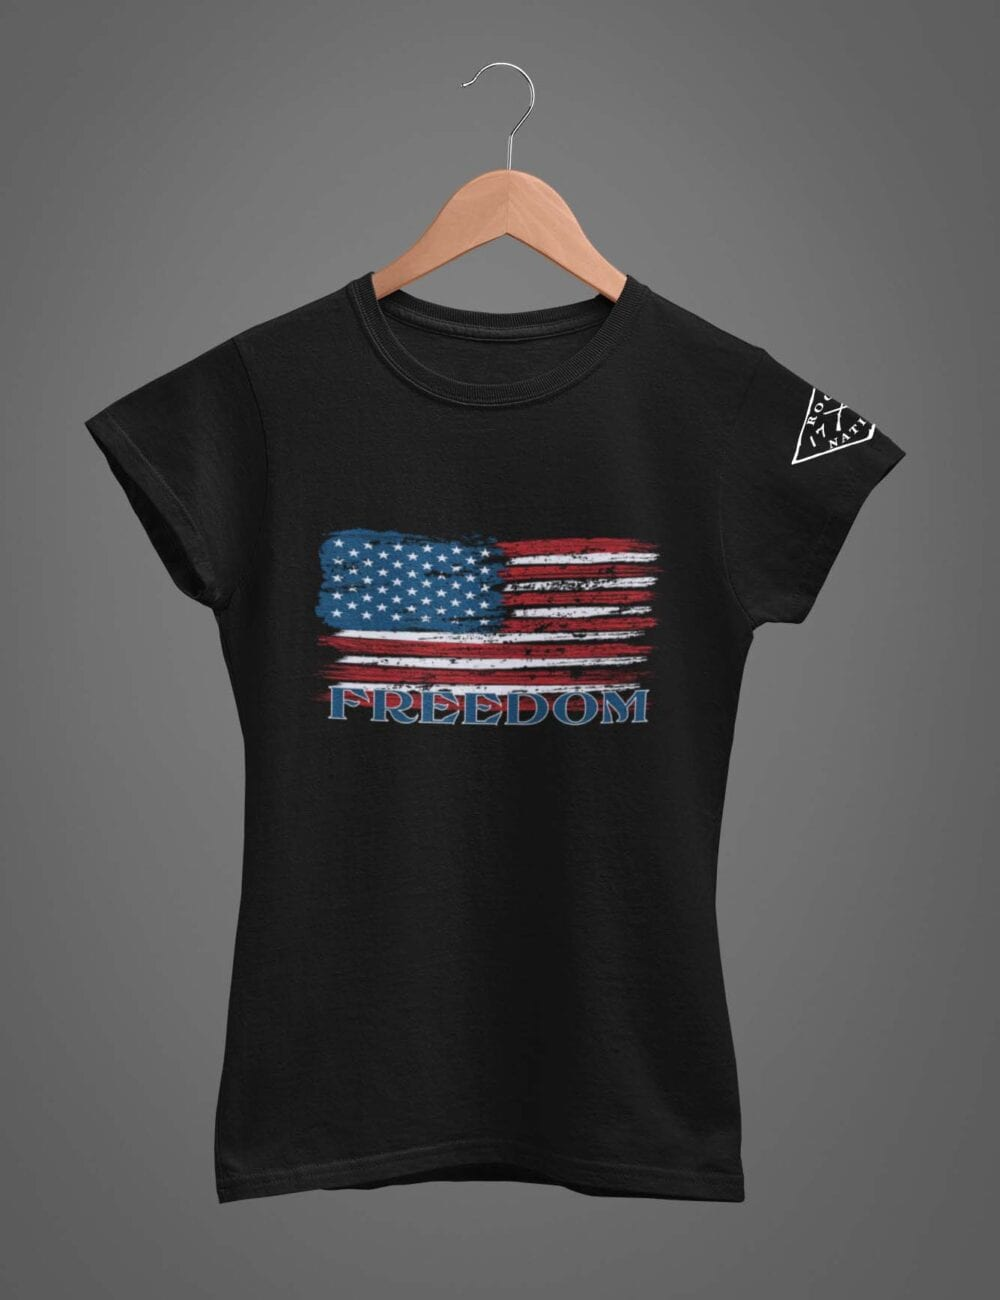 Freedom T-Shirt on Women's Black